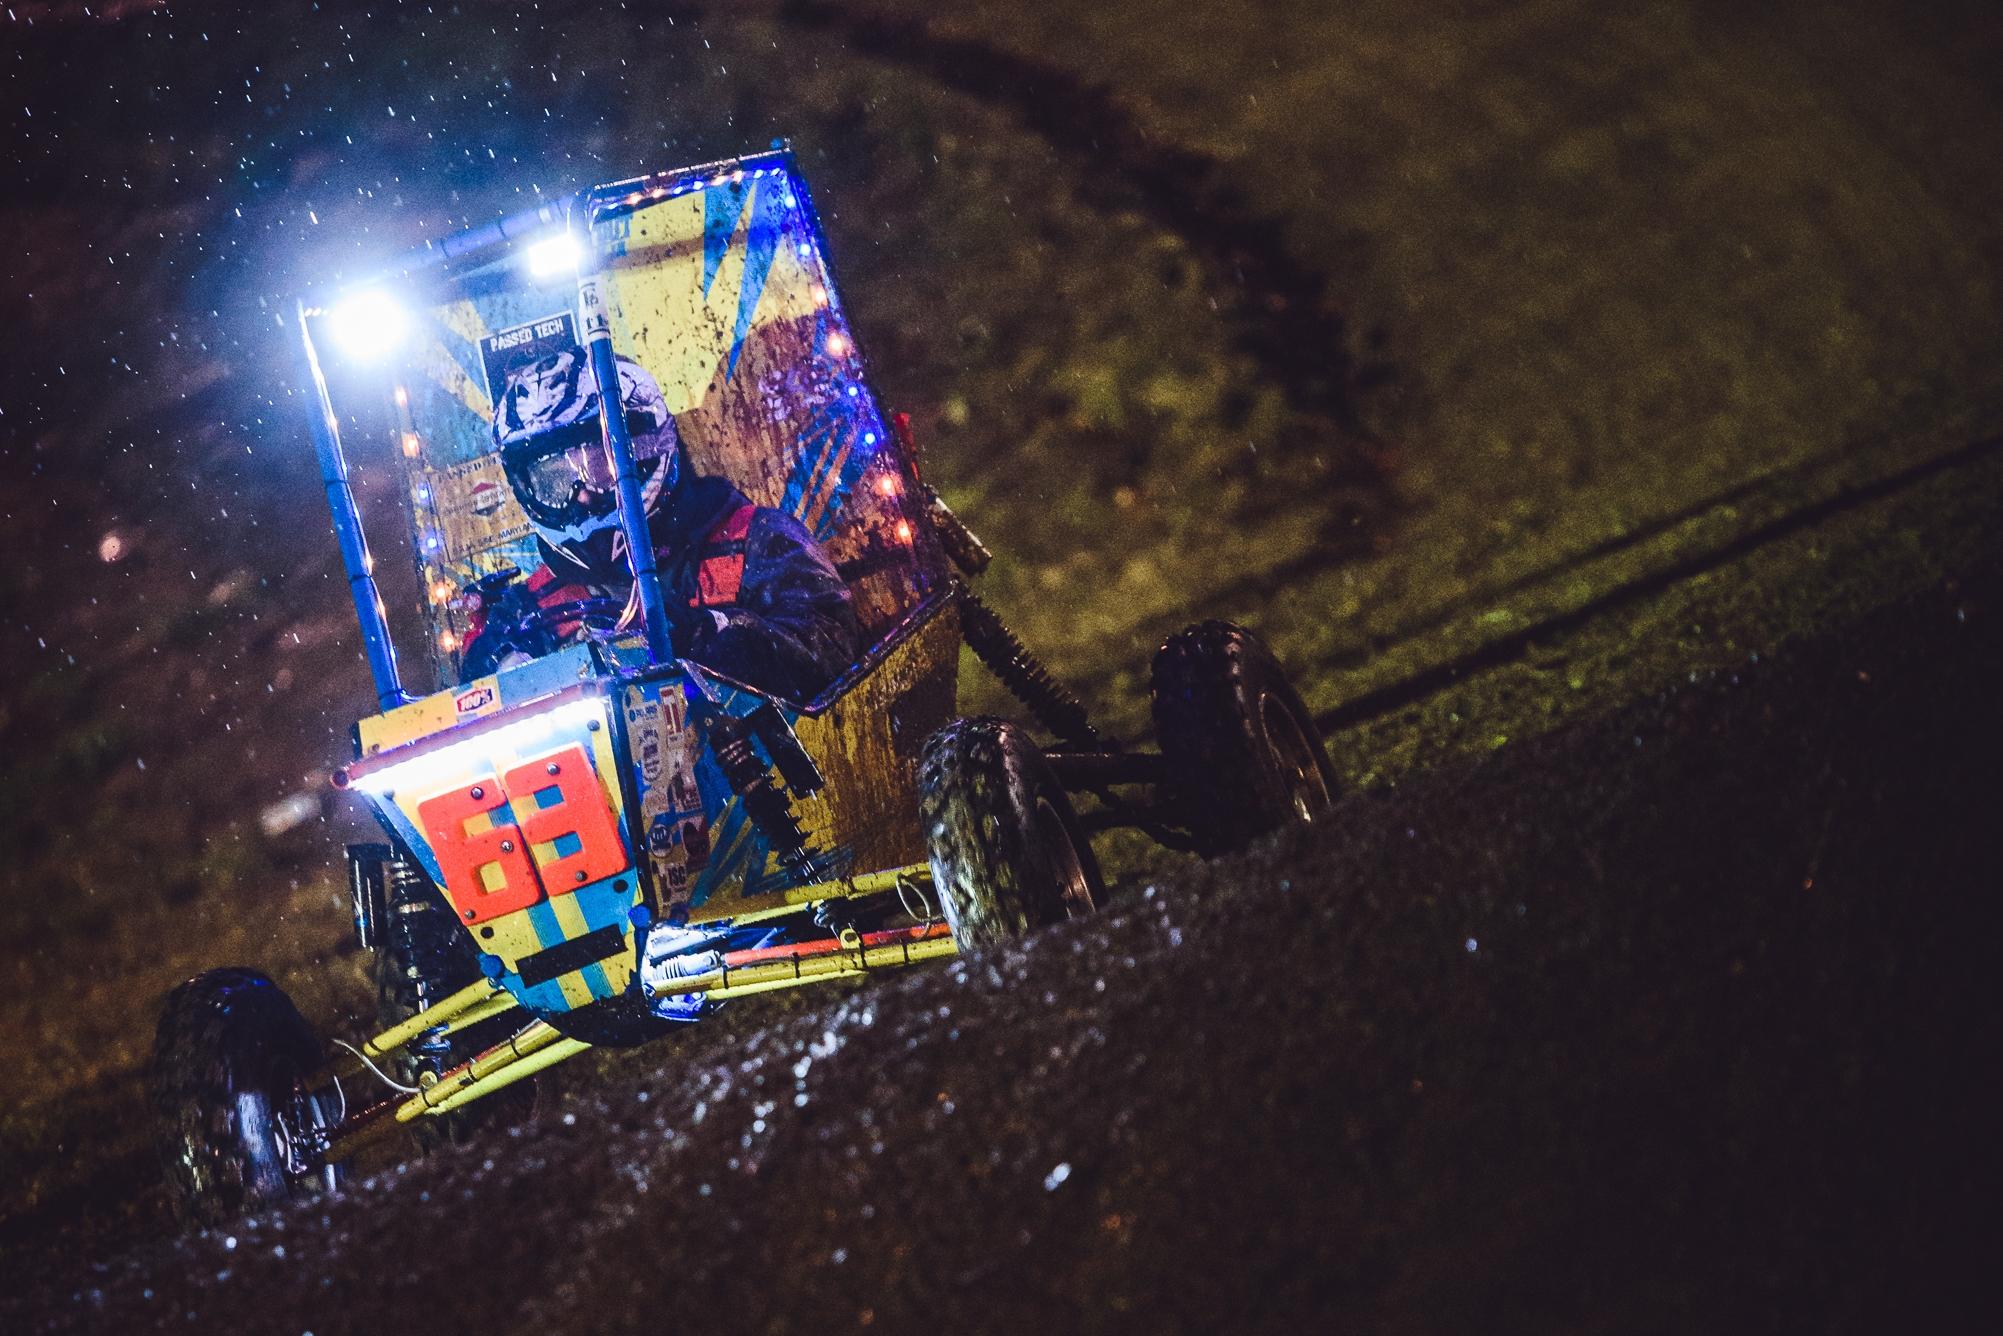 1st Place: University of Wisconsin - Stout - Car# 63 | 54 Laps